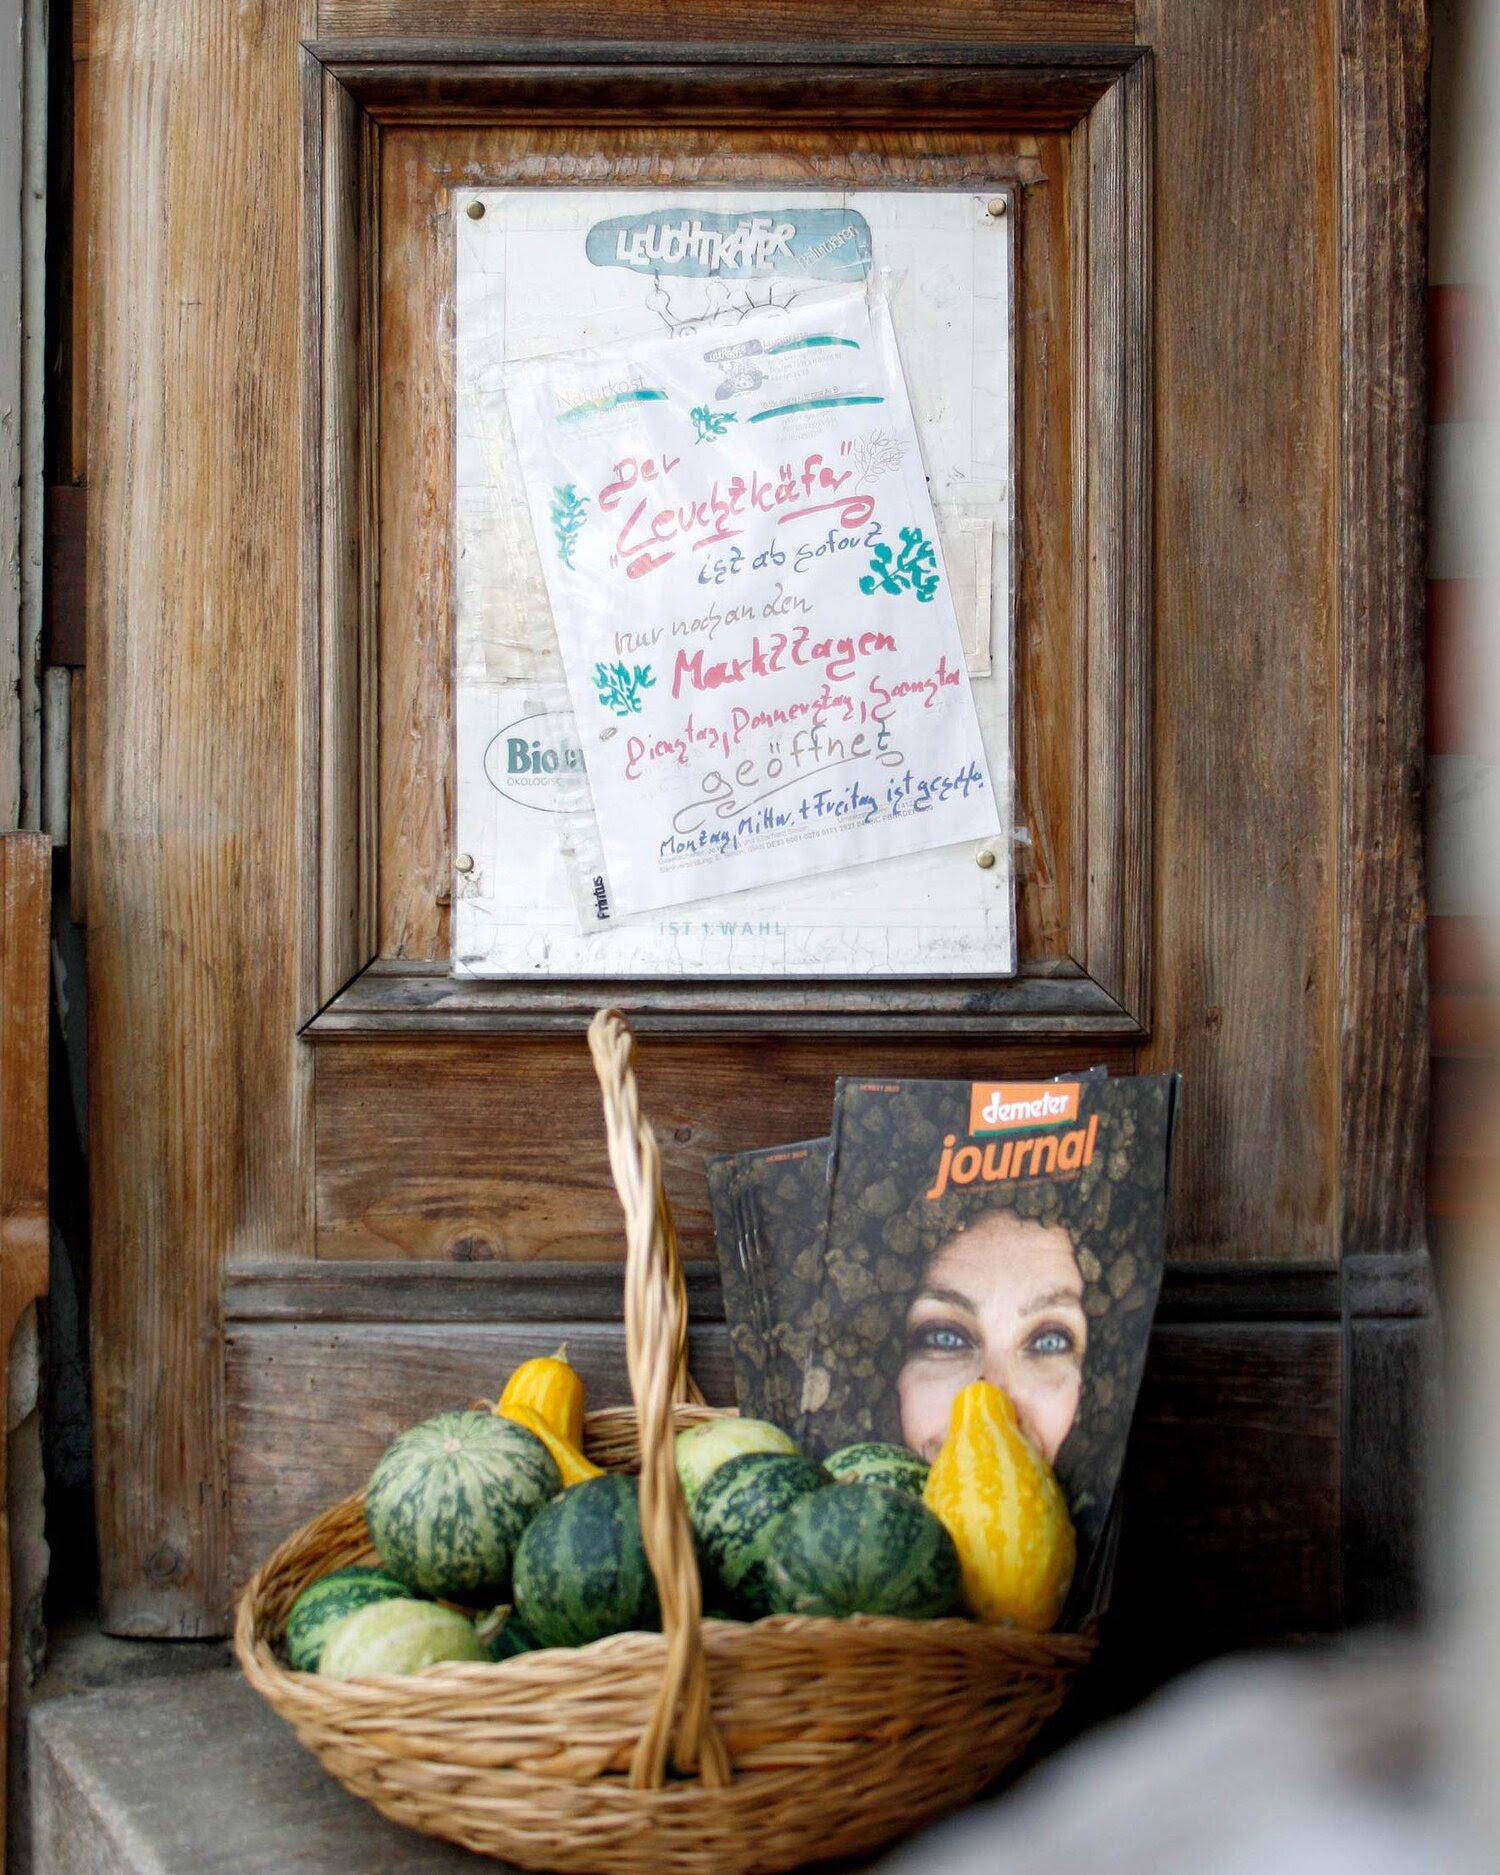 12 x nachhaltig einkaufen in ludwigsburg — hallo ludwigsburg